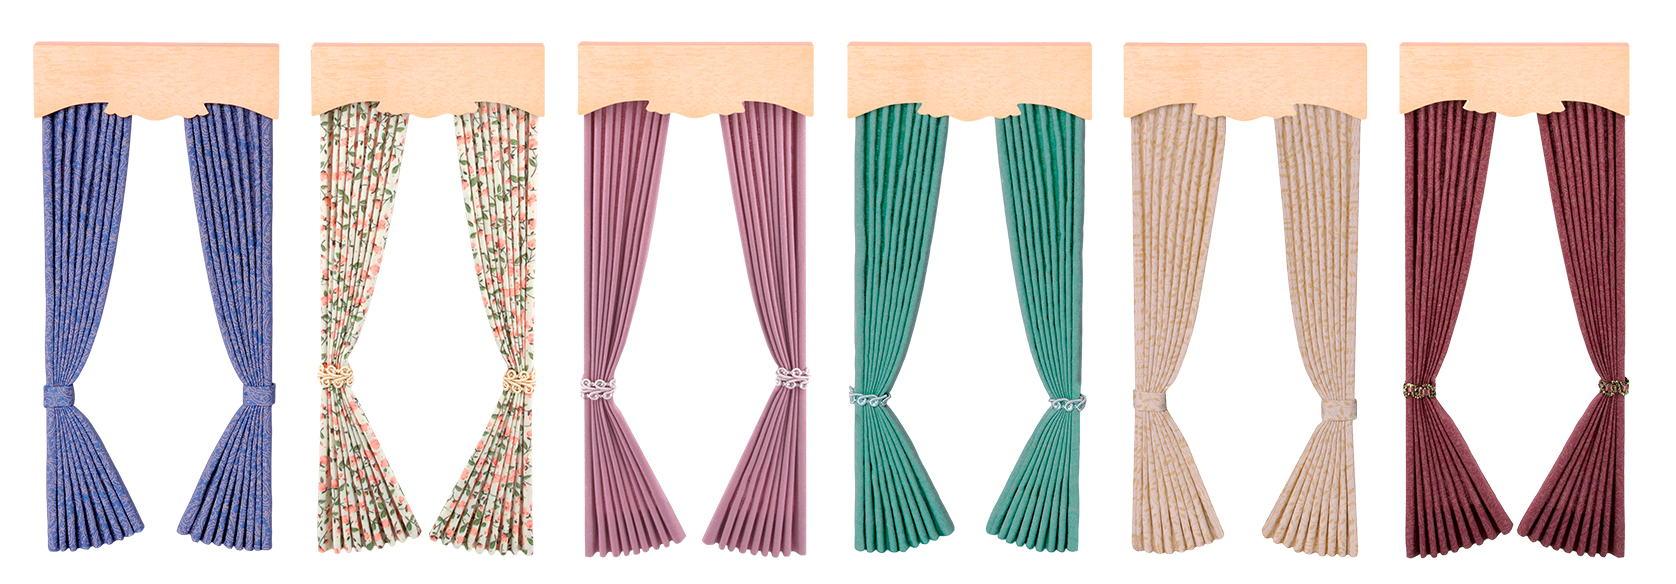 Window curtains and fabrics